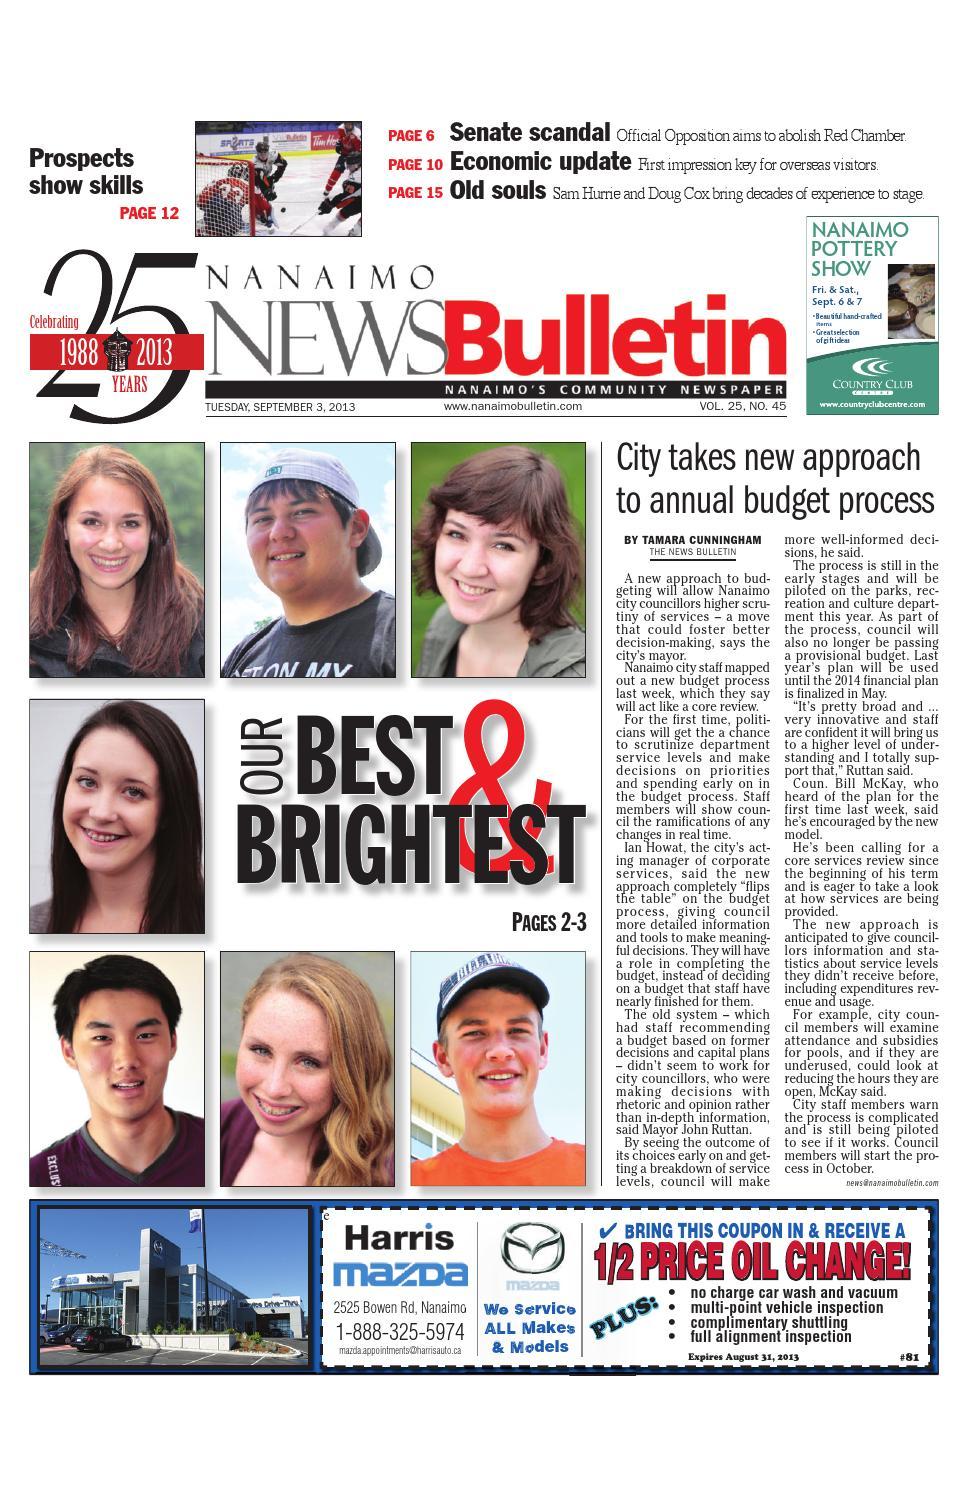 Nanaimo News Bulletin, September 03, 2013 by Black Press Media Group - issuu